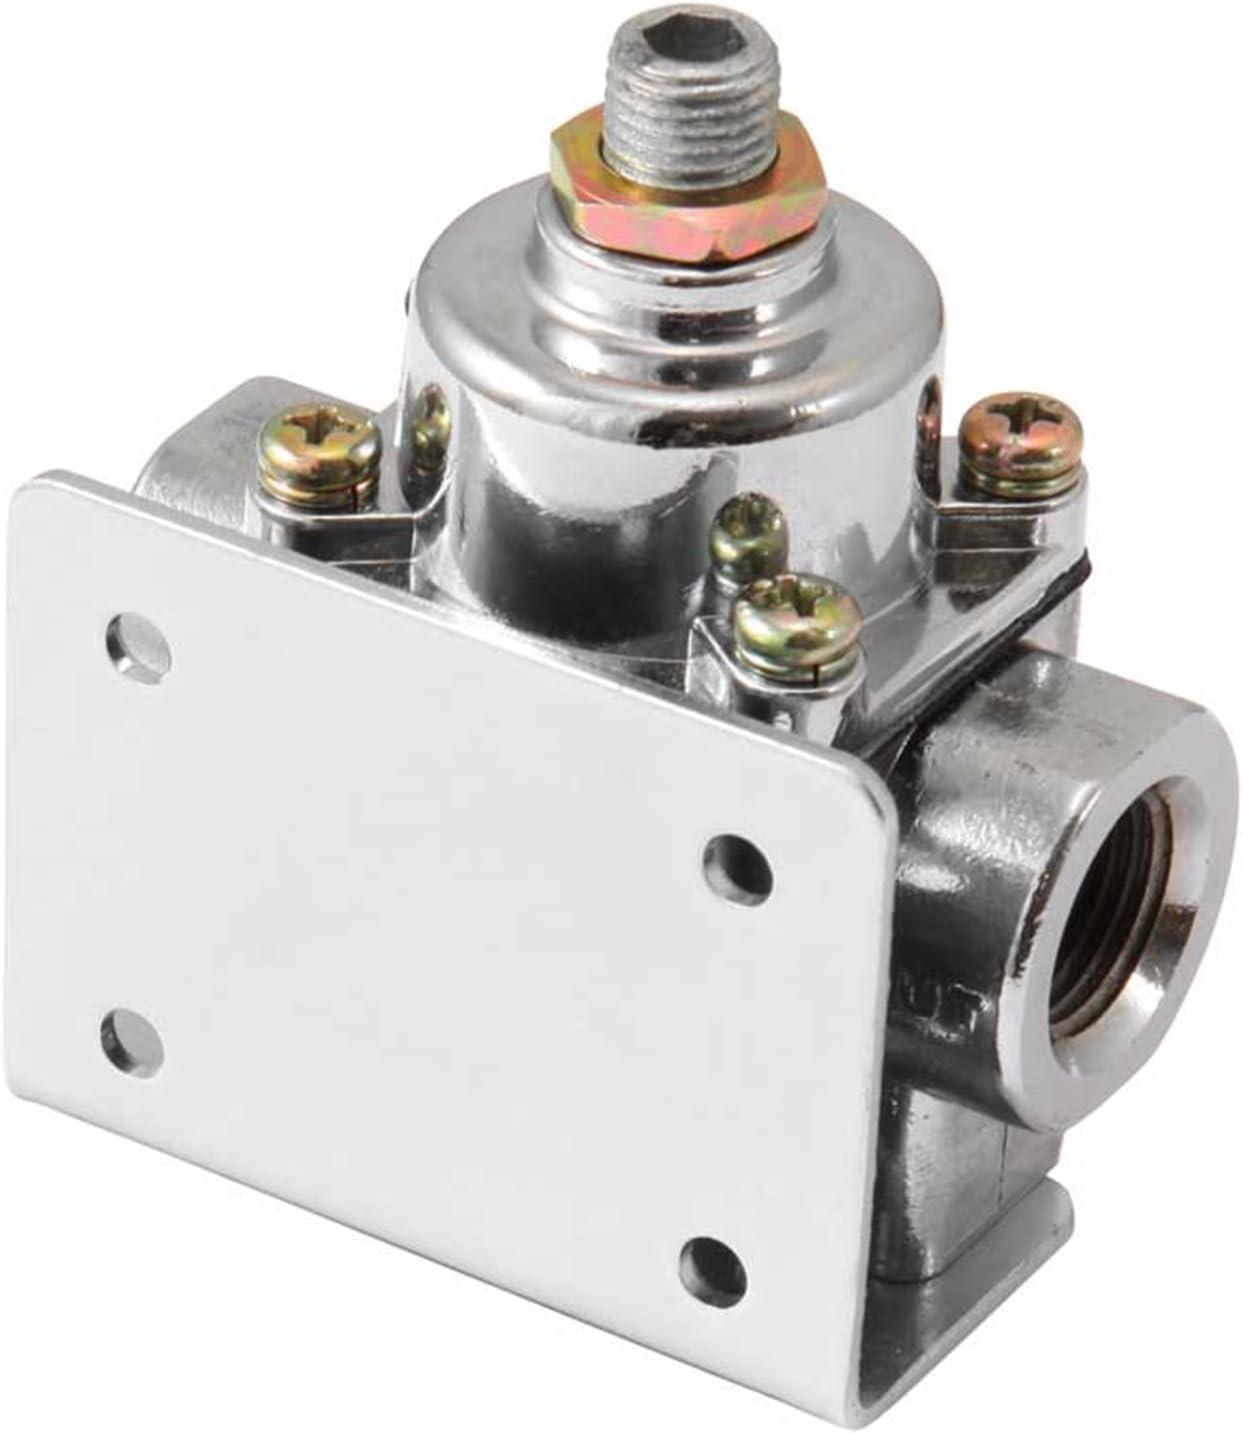 Spectre Performance 2519 Fuel Pressure Regulator